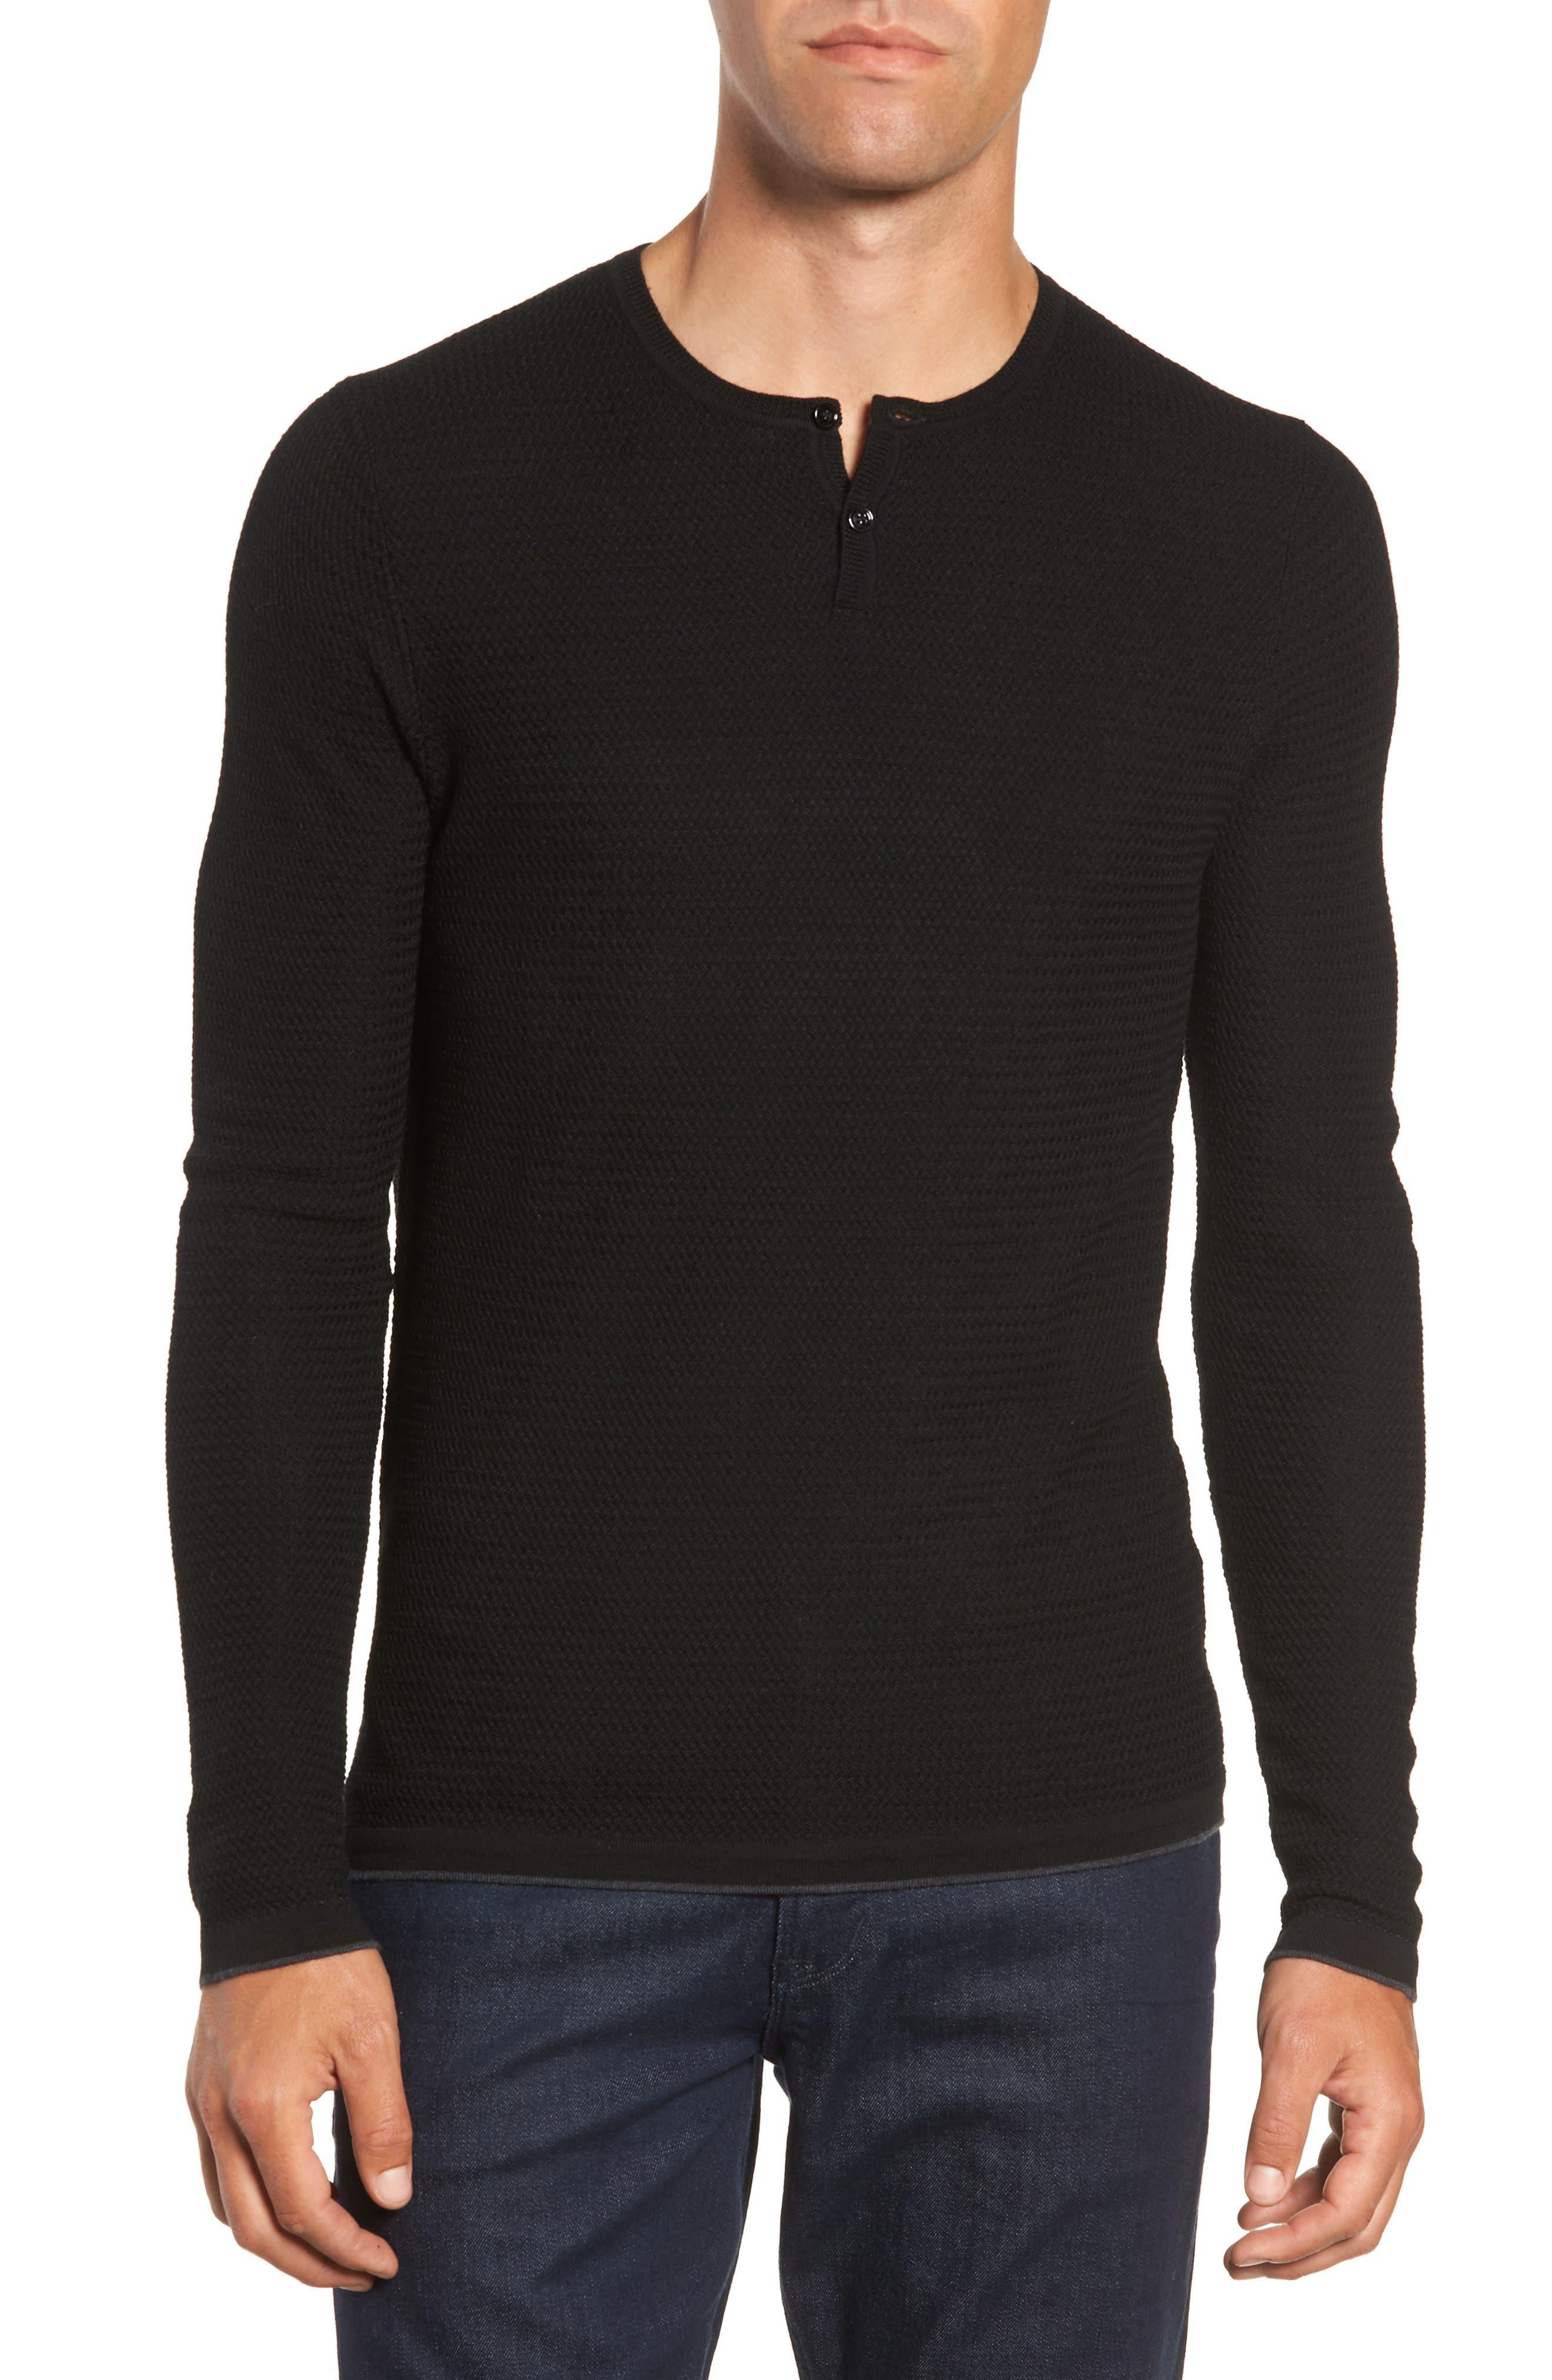 Hawthorn Wool Blend Thermal,                         Main,                         color, BLACK